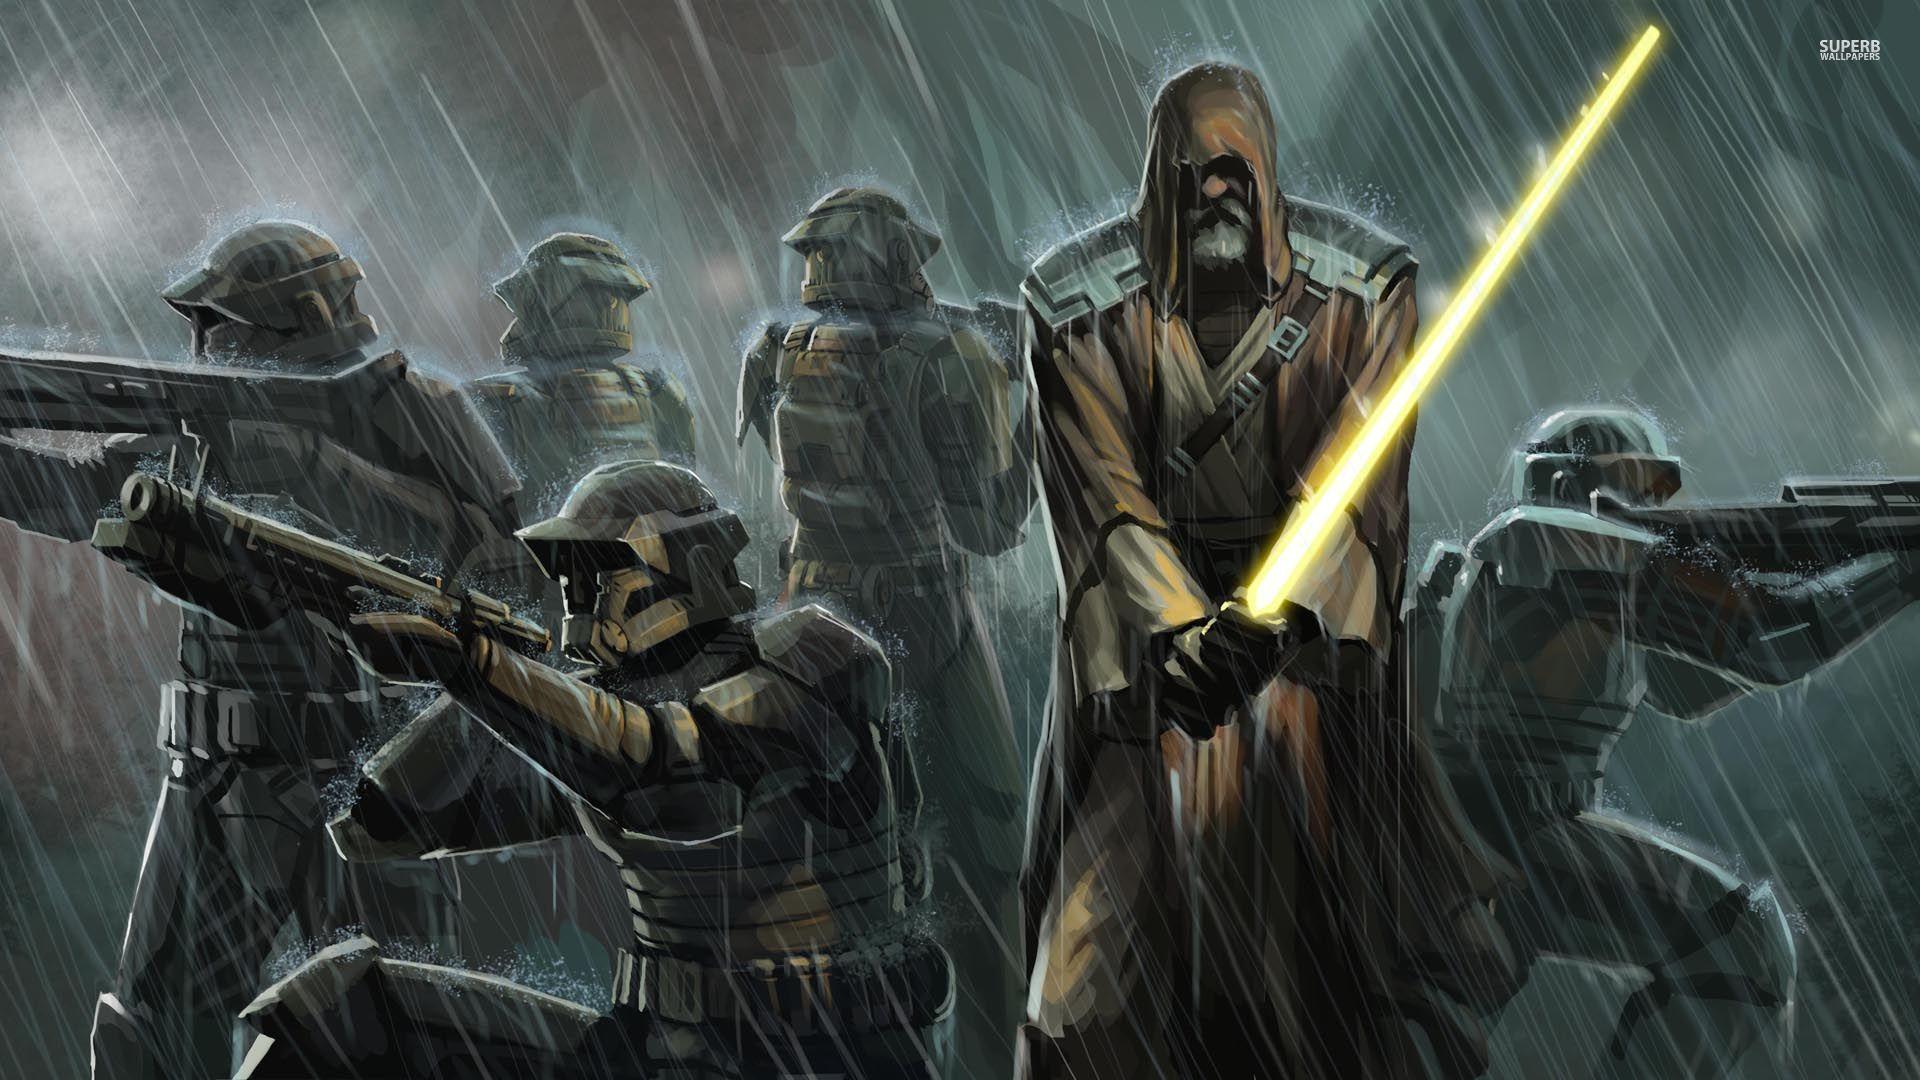 stormtrooper concept art Google Search Star Wars